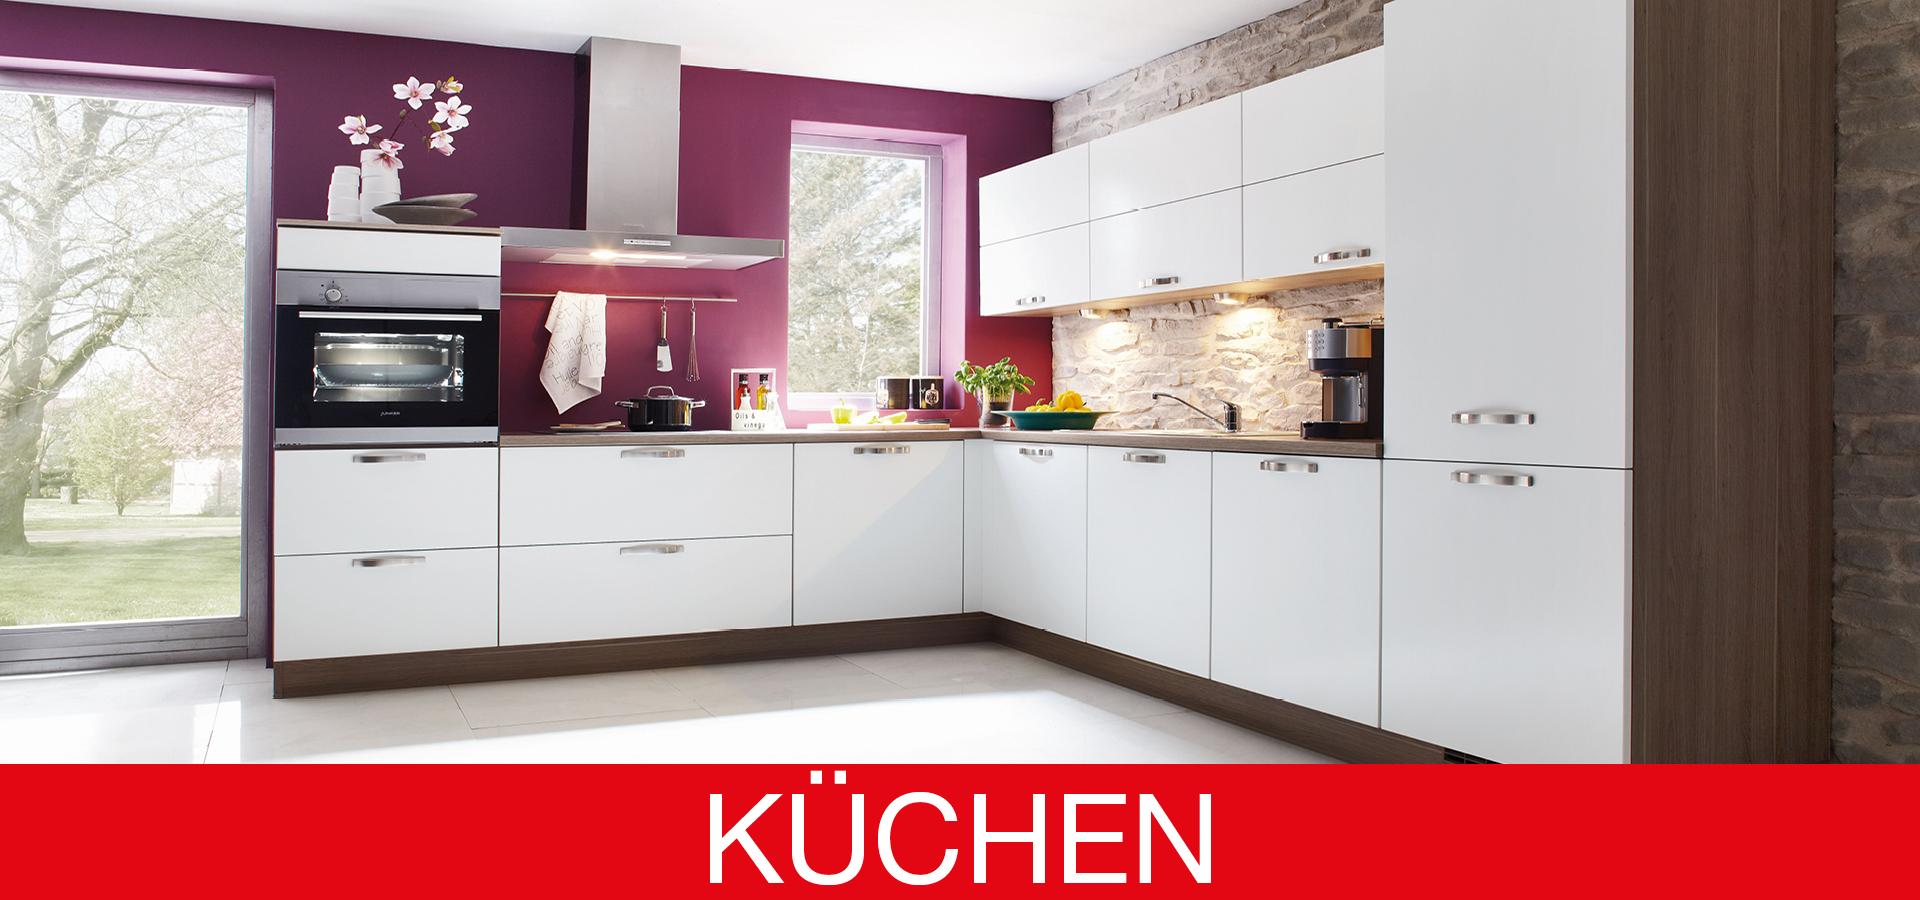 Full Size of Mülleimer Küche Billig Spüle Küche Billig Küche Günstig Deutschland Küche Arbeitsplatte Billig Küche Küche Billig